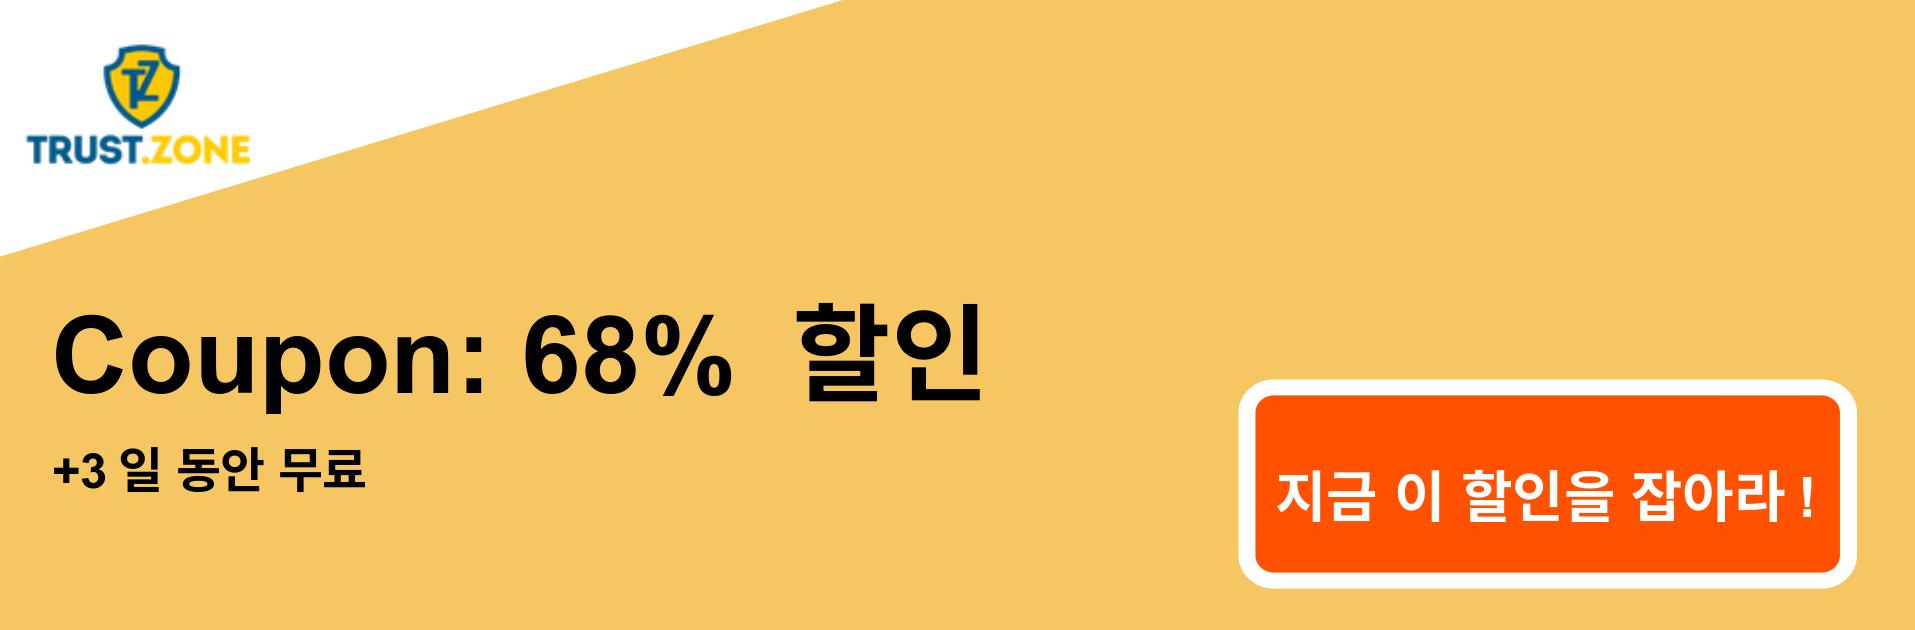 Trust.Zone VPN 쿠폰 배너-68 % 할인